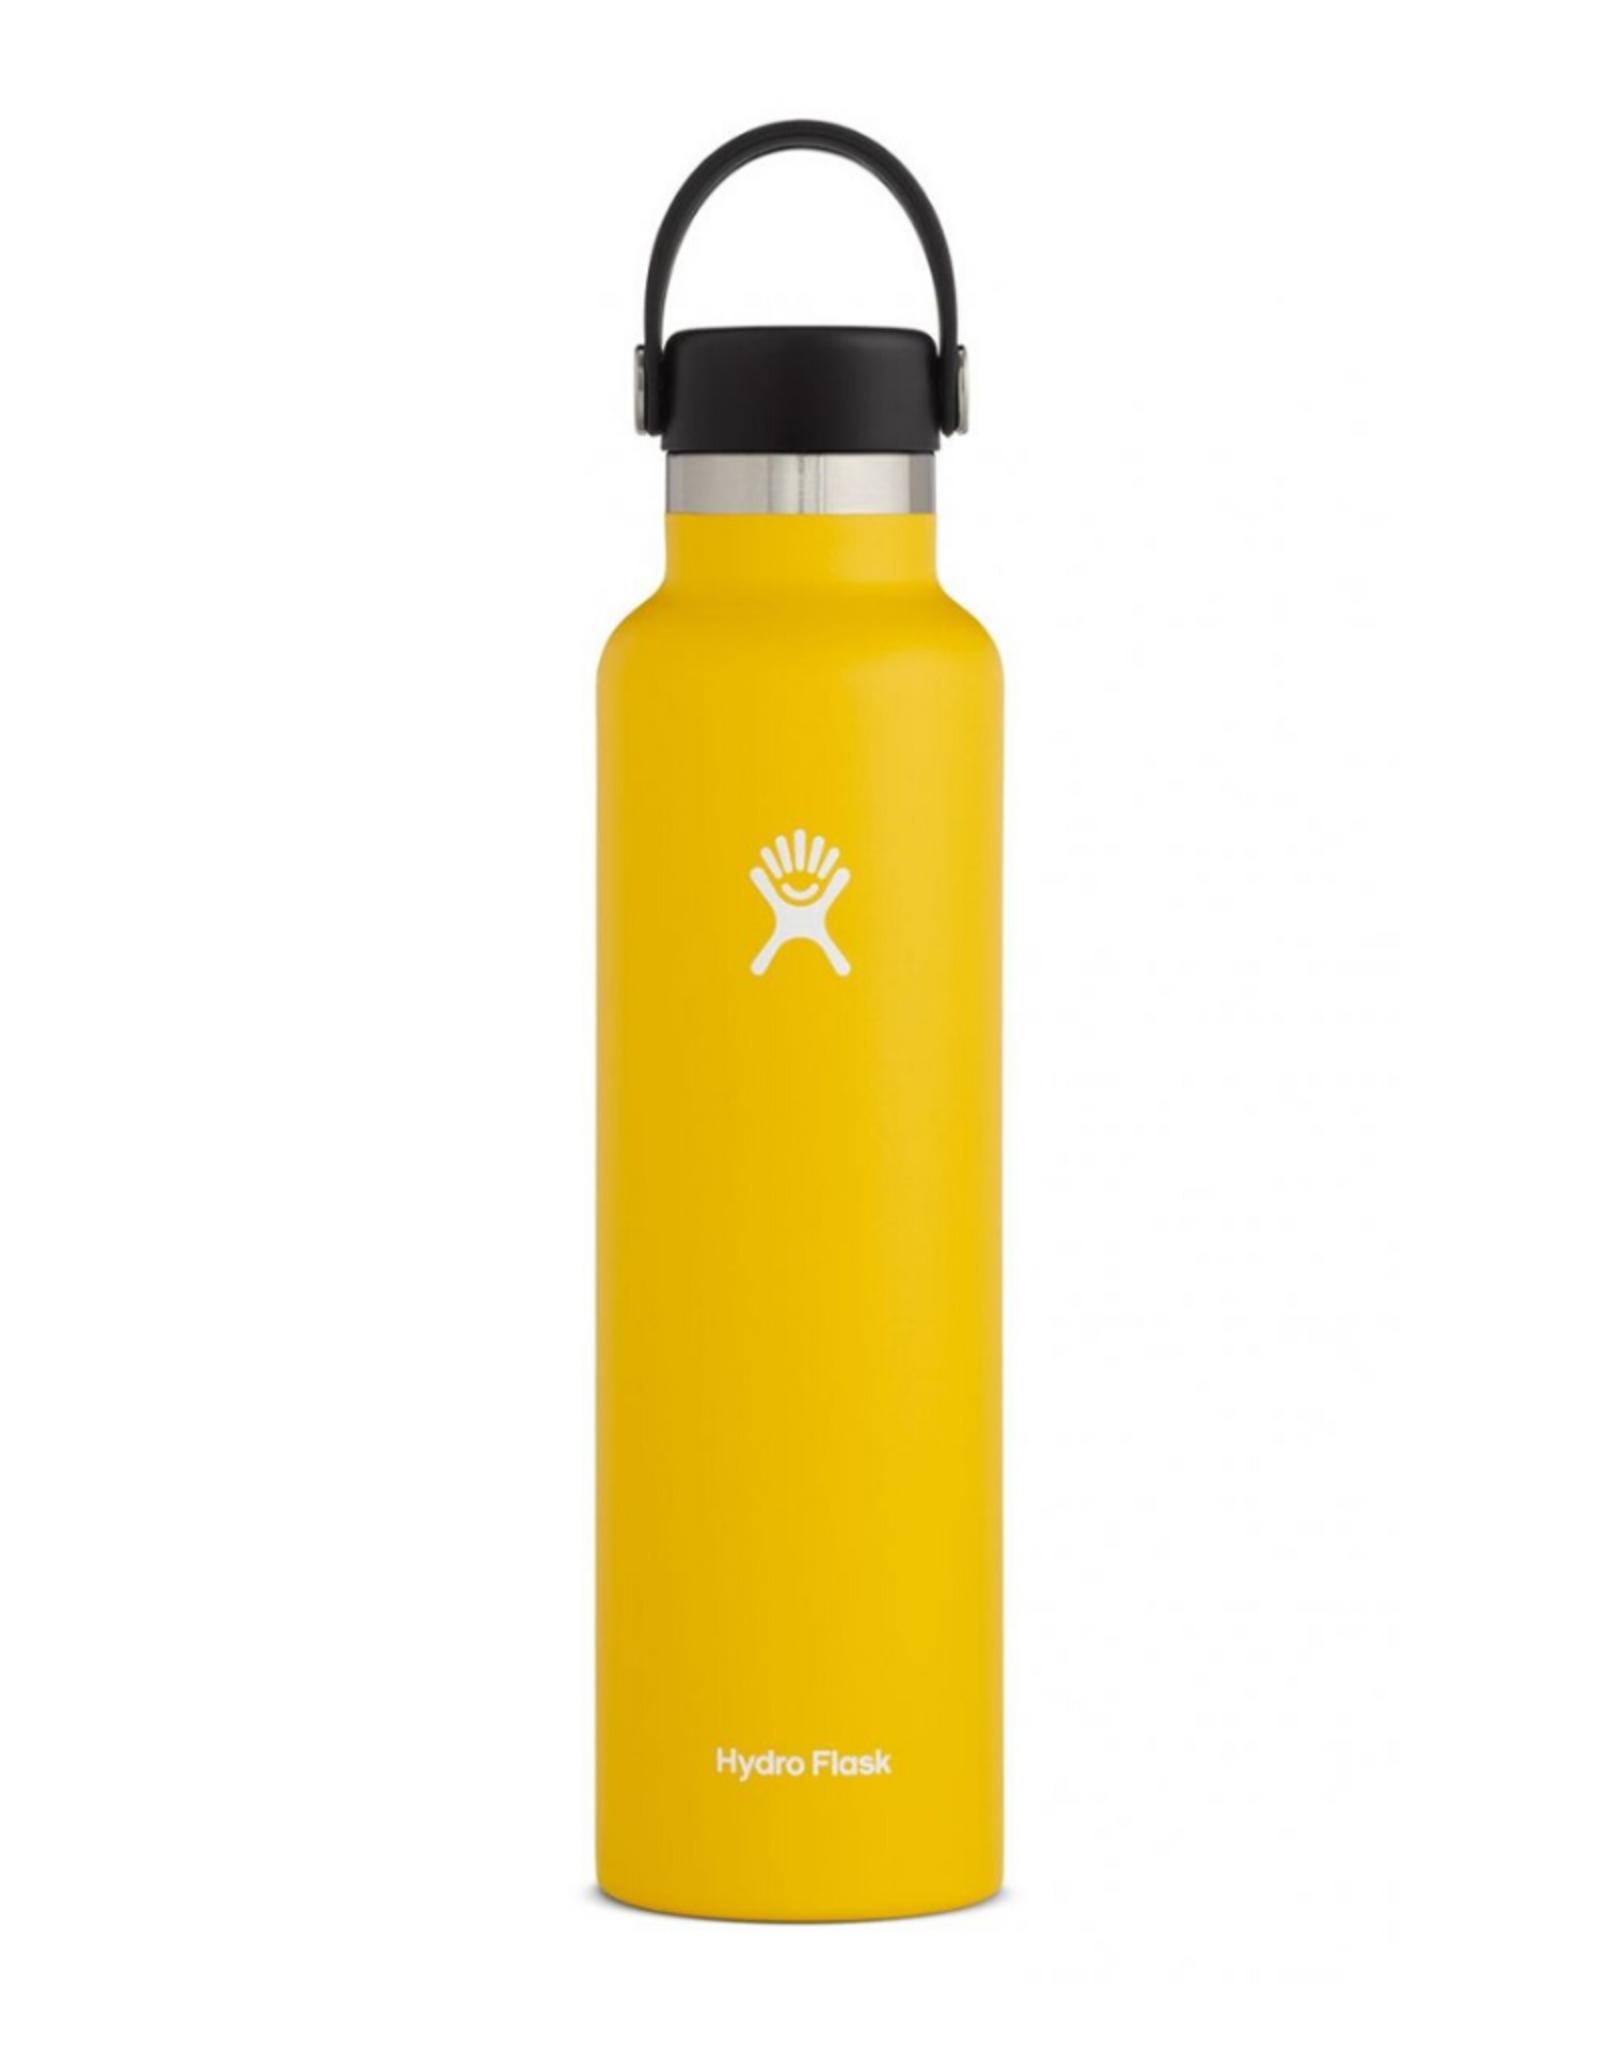 Hydro Flask Hydro Flask Standard with Flex Blk Cap